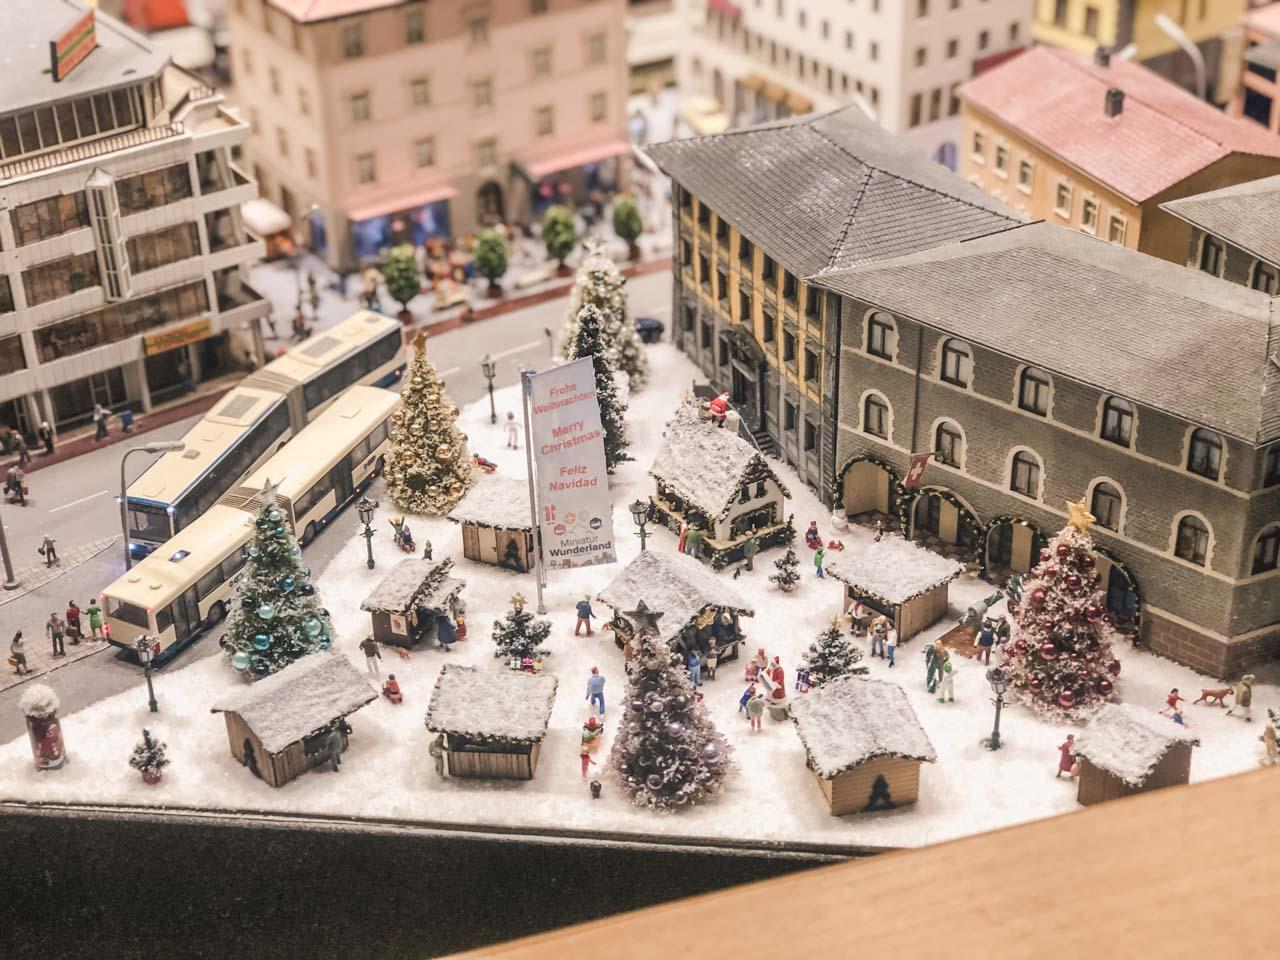 Figurines inside Miniatur Wunderland in Hamburg